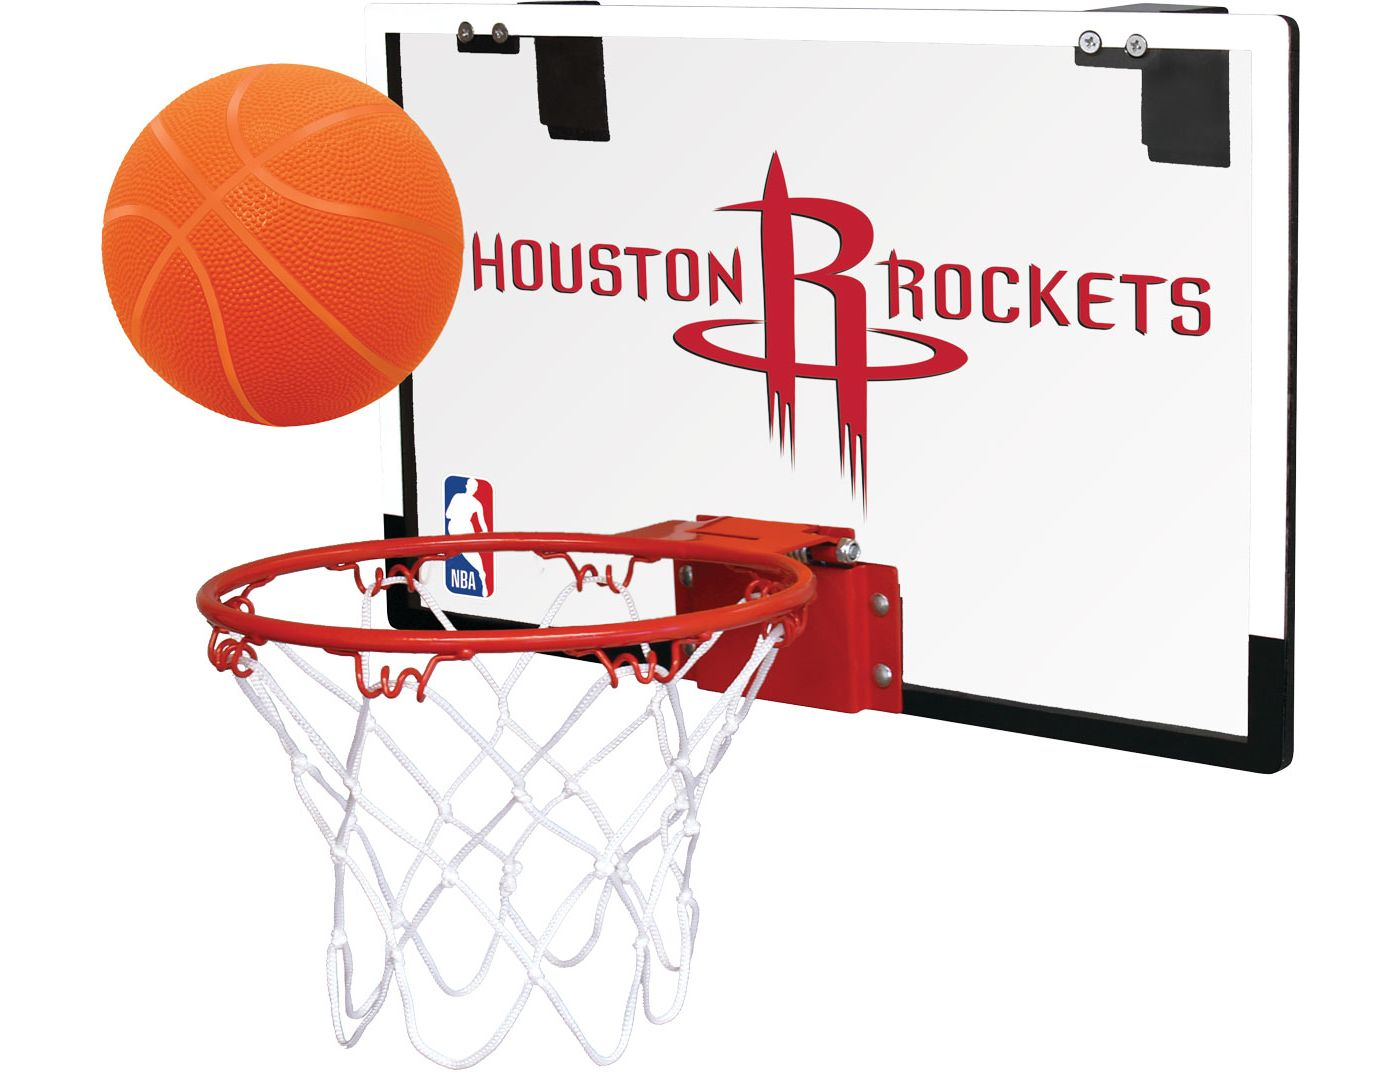 Rawlings Houston Rockets Polycarbonate Hoop Set